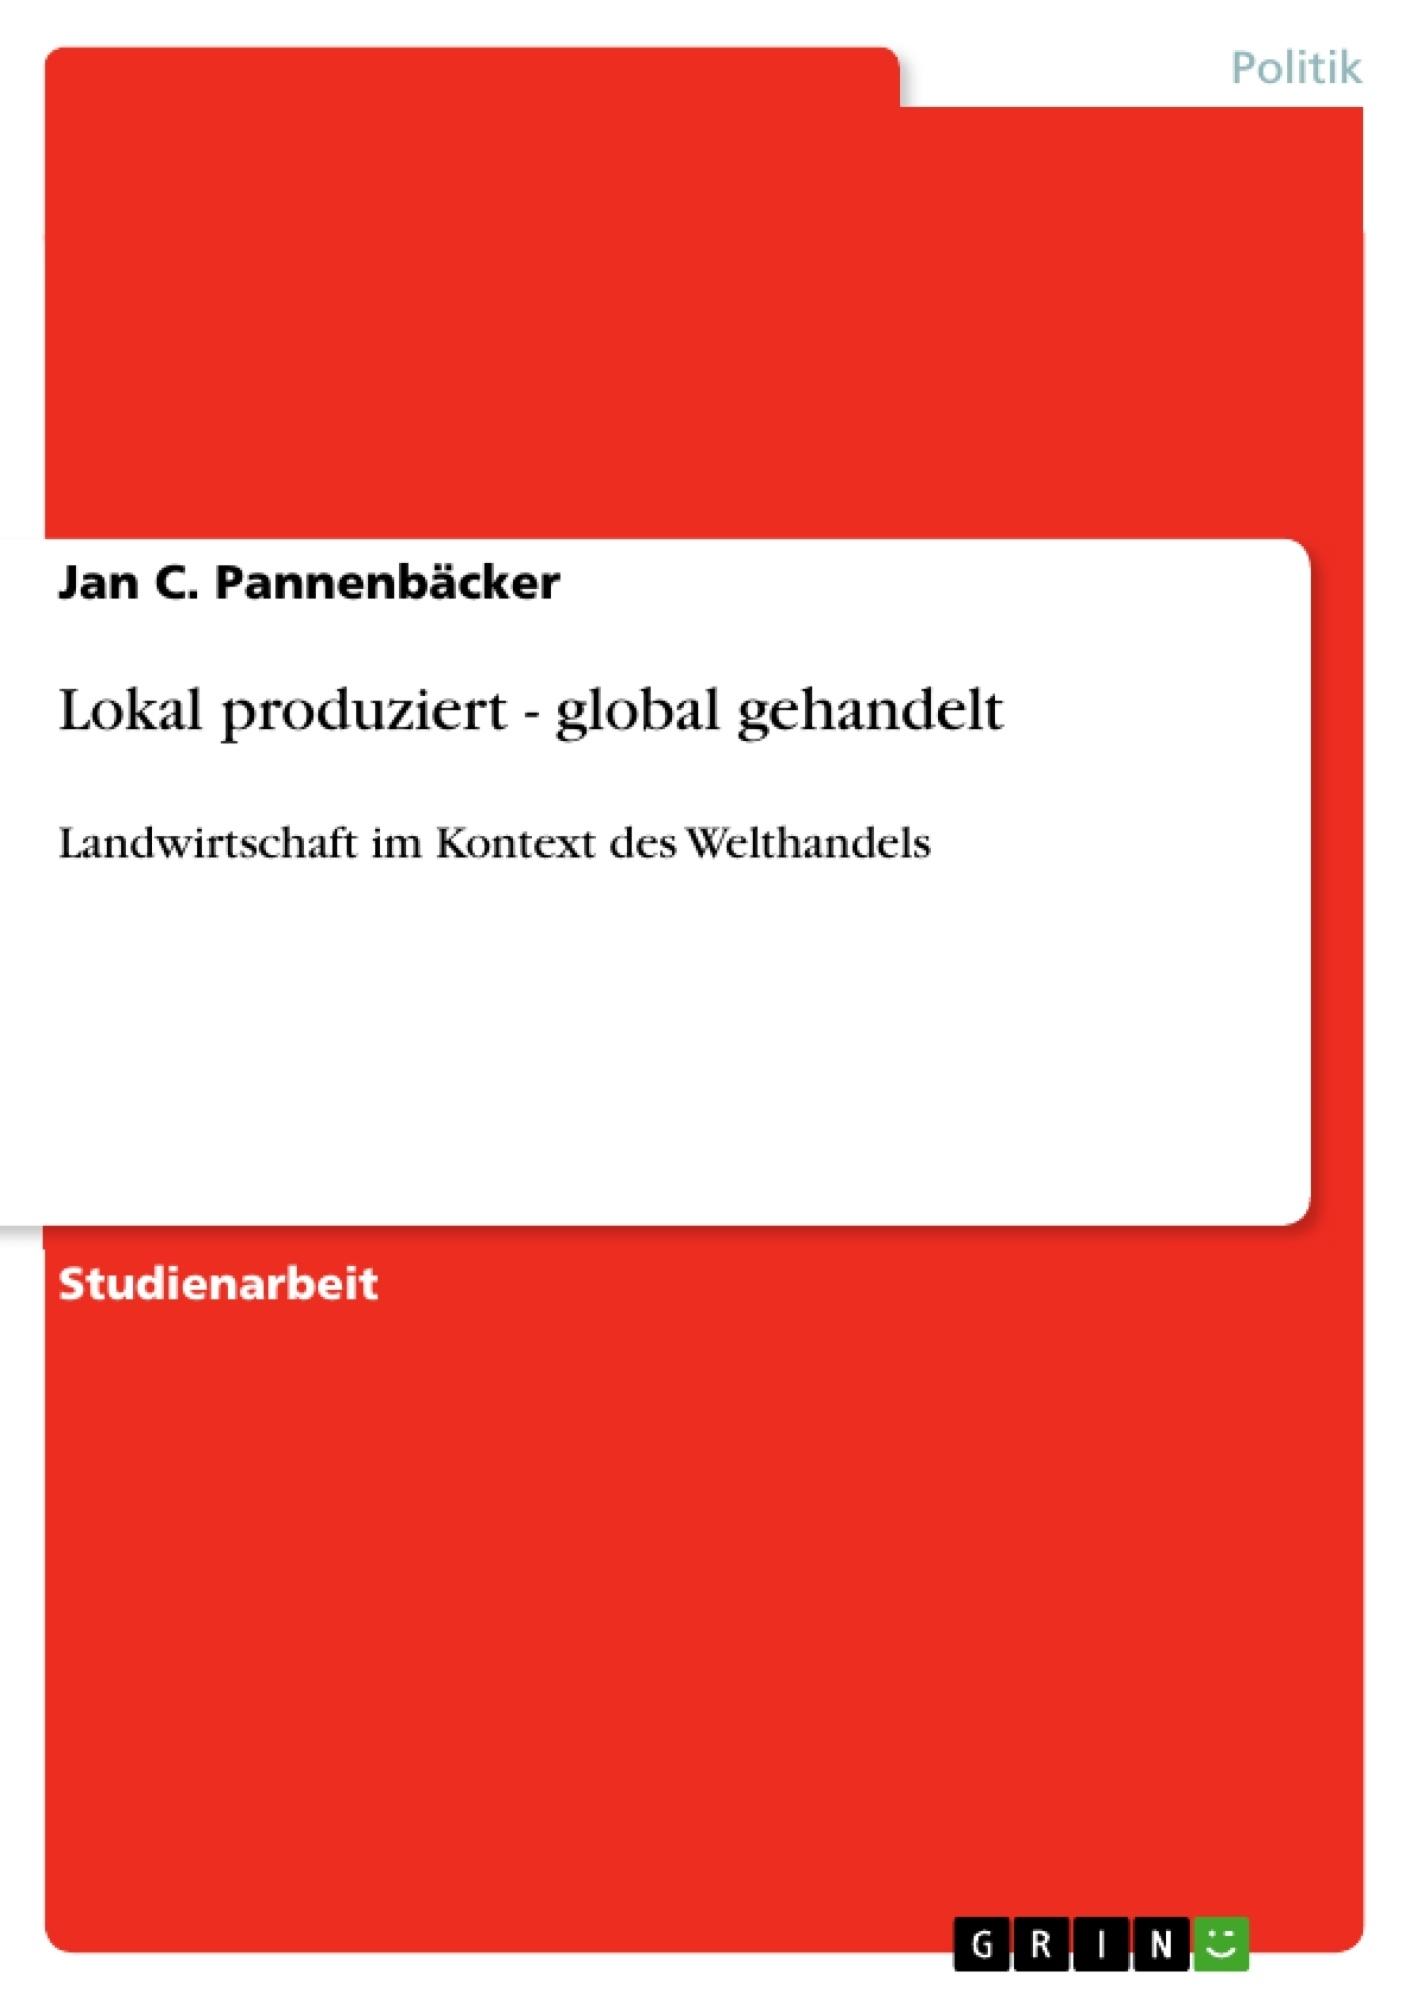 Titel: Lokal produziert - global gehandelt